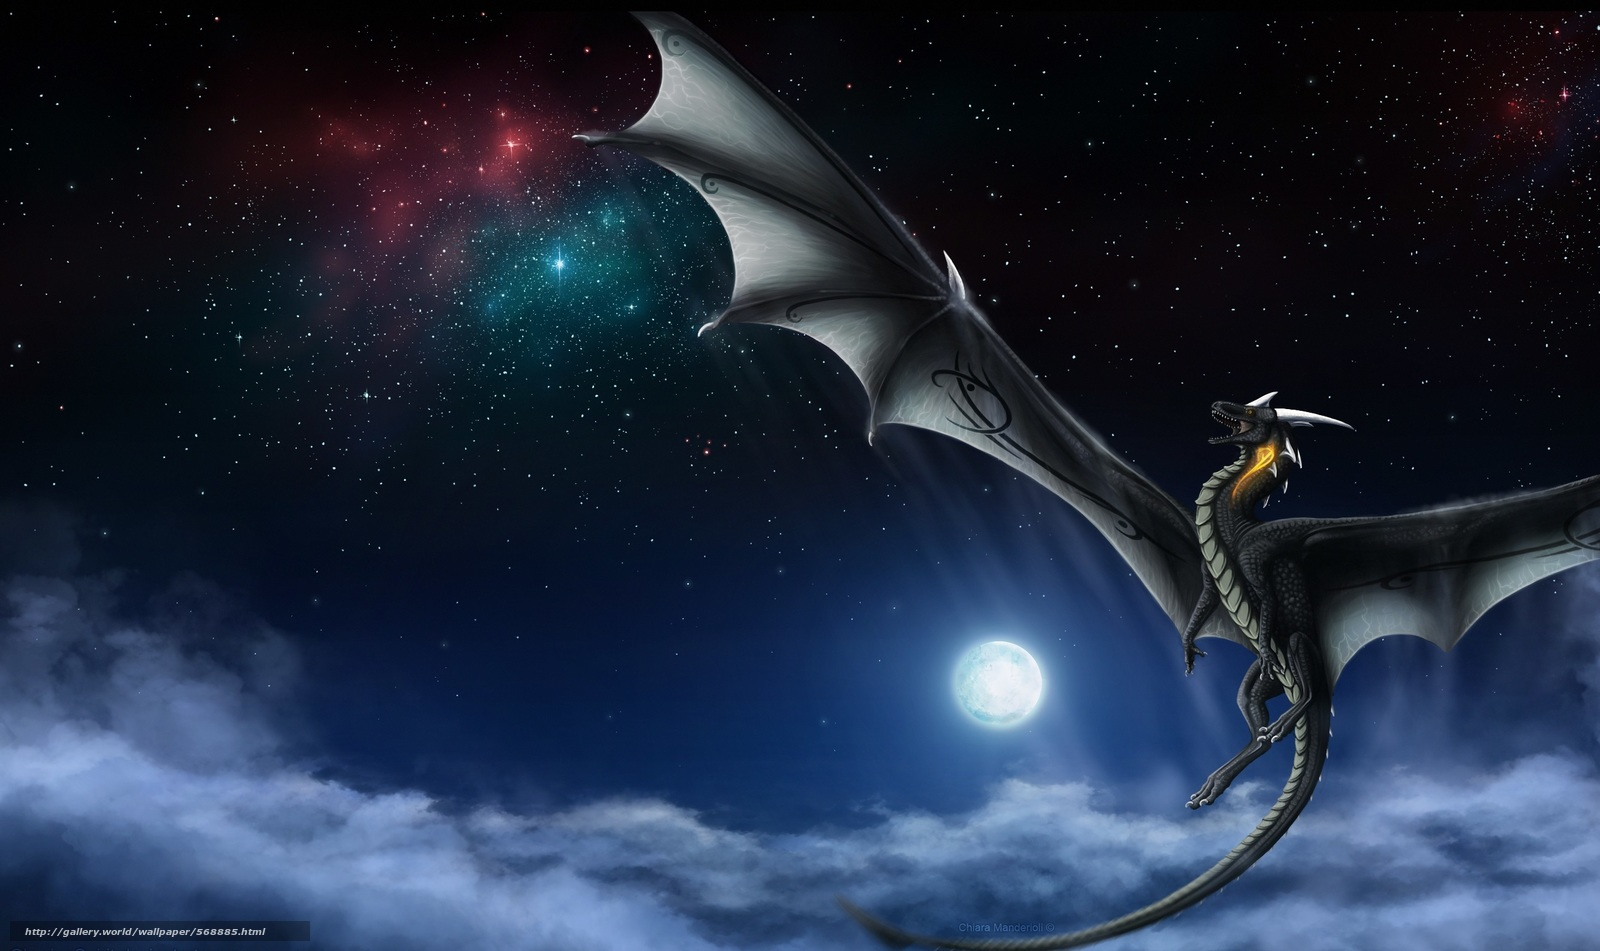 dragons flight across the frozen seas